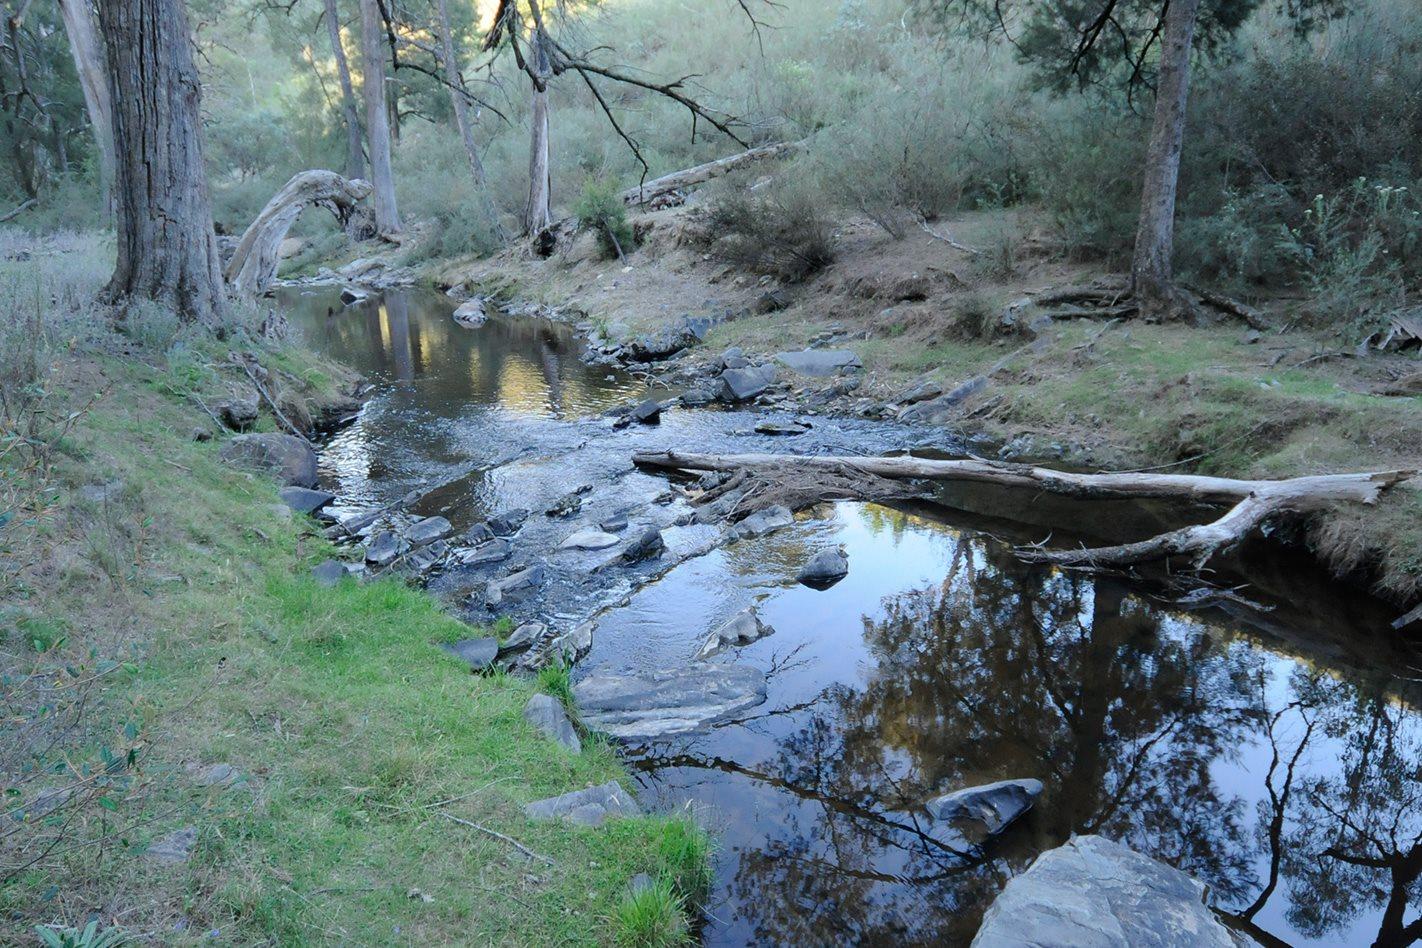 abercrombie-River-NP,-NSW-creek.jpg